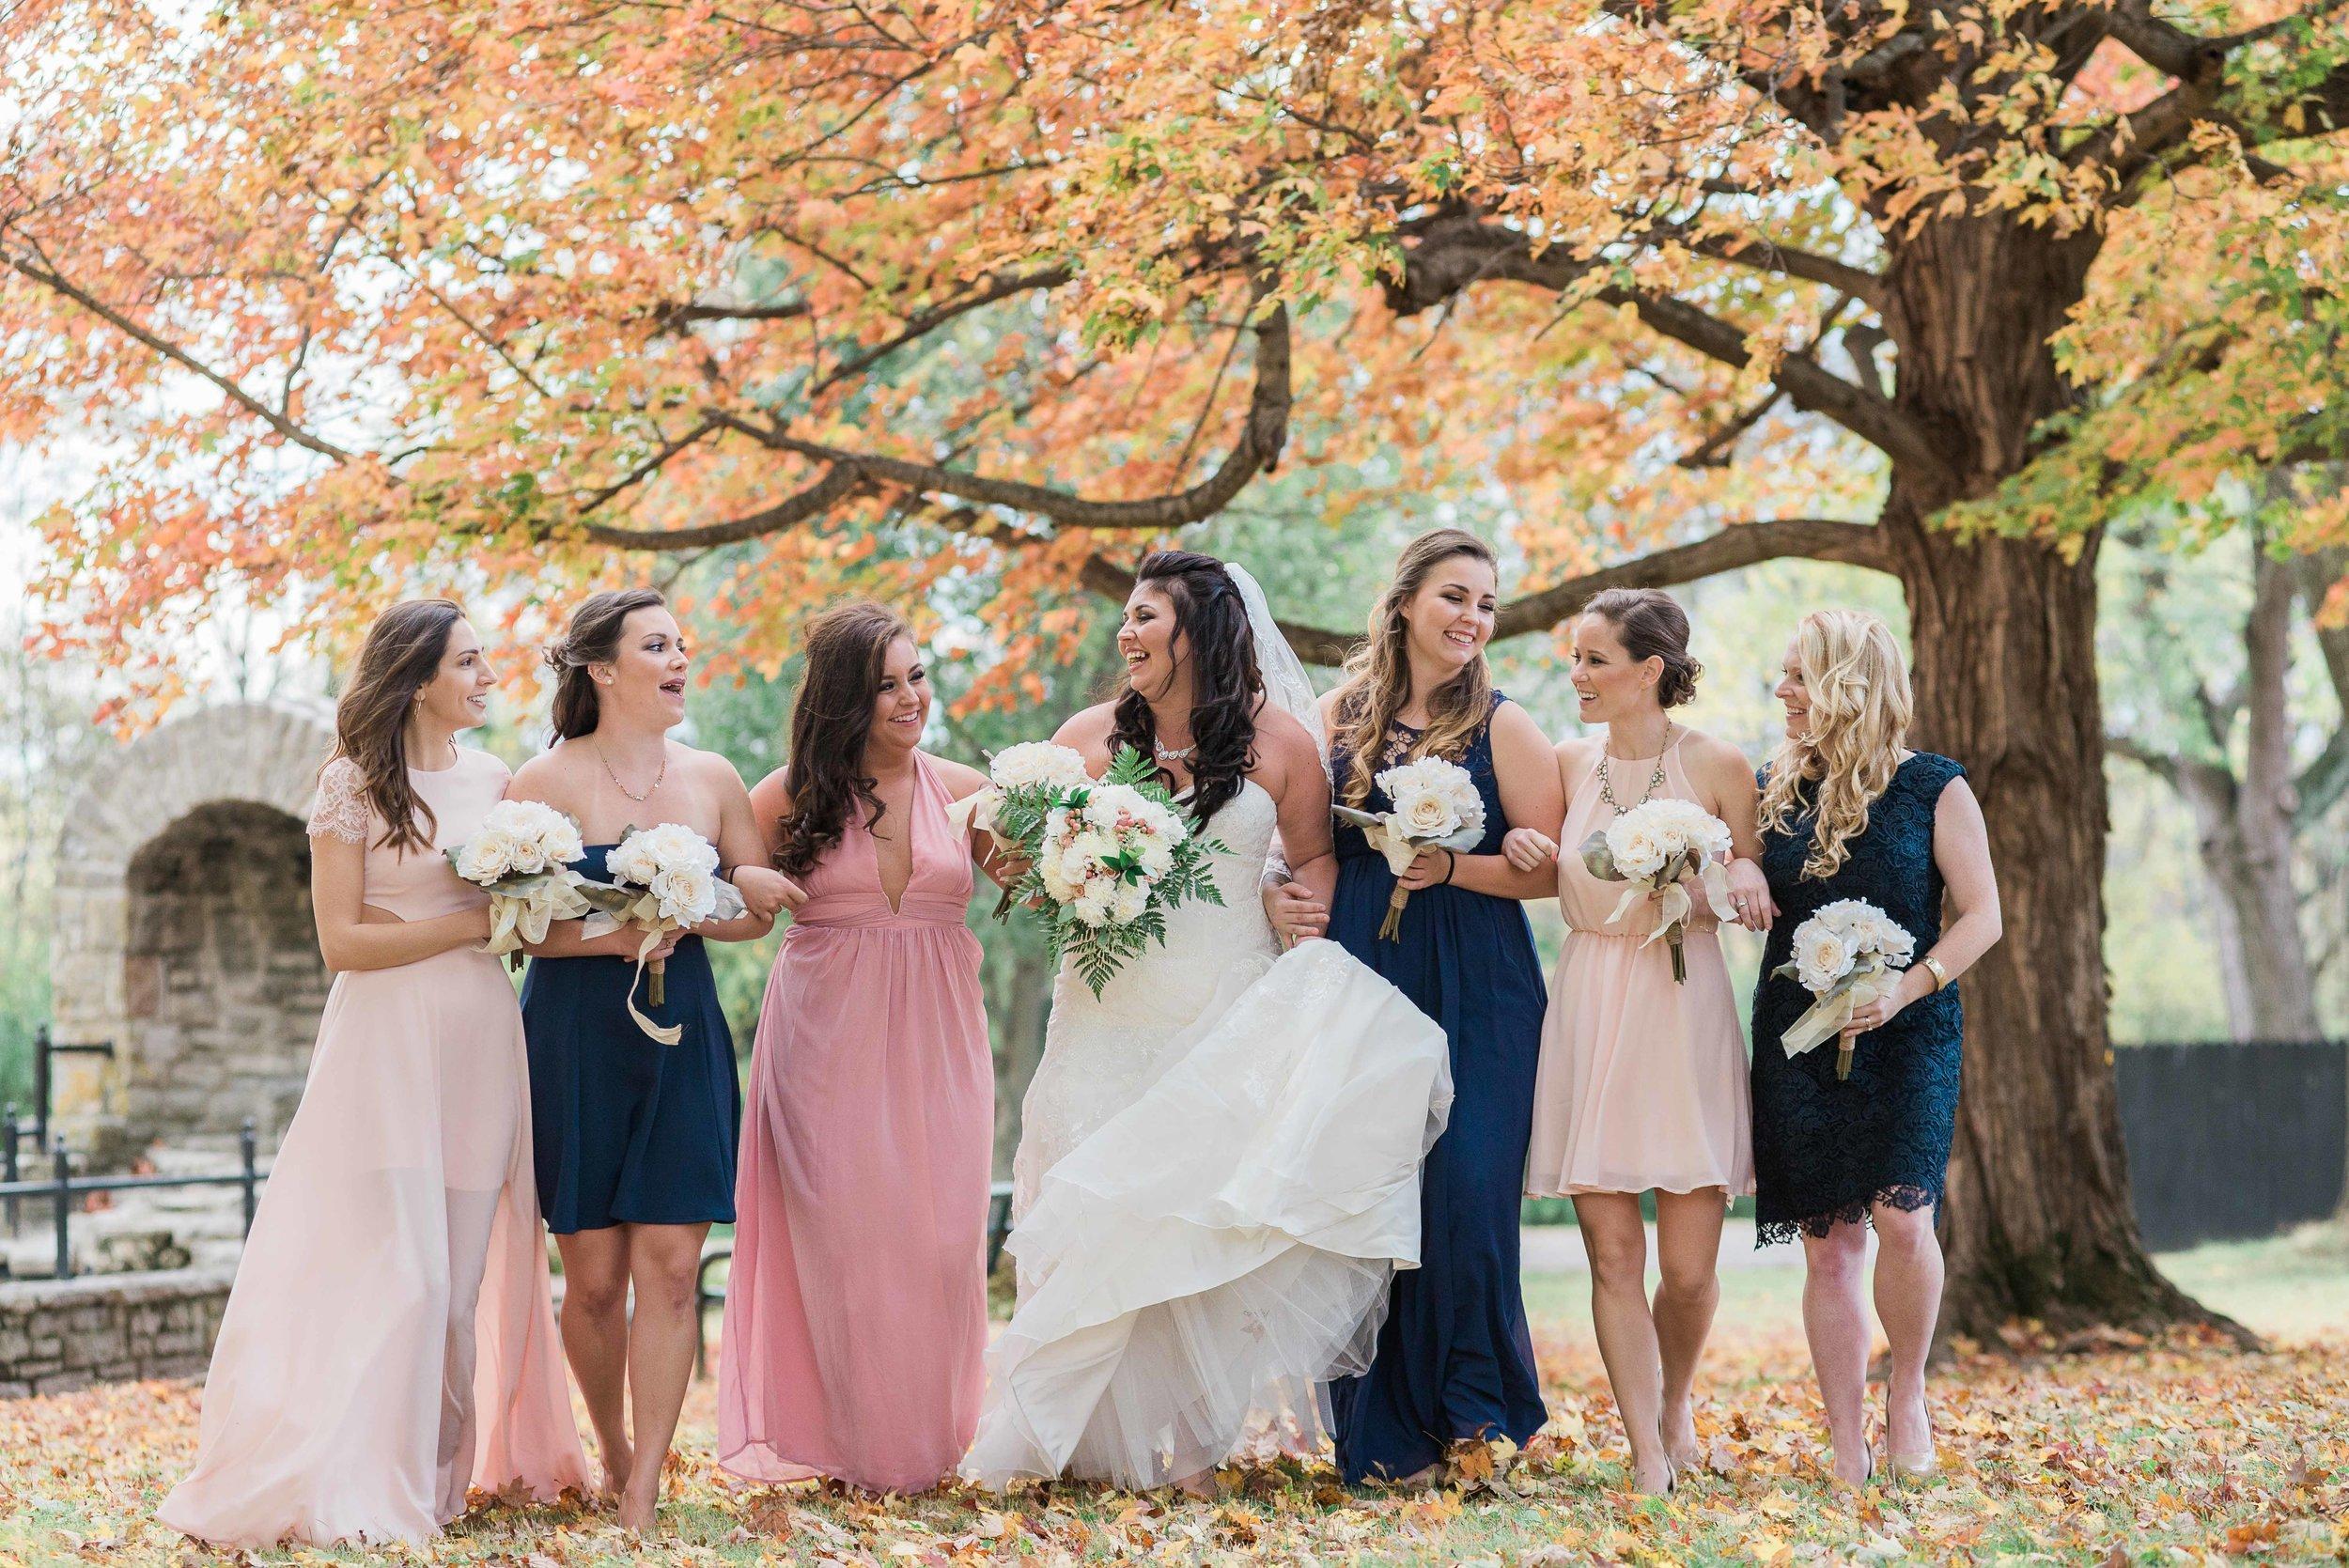 Cardome Center wedding, Georgetown, KY